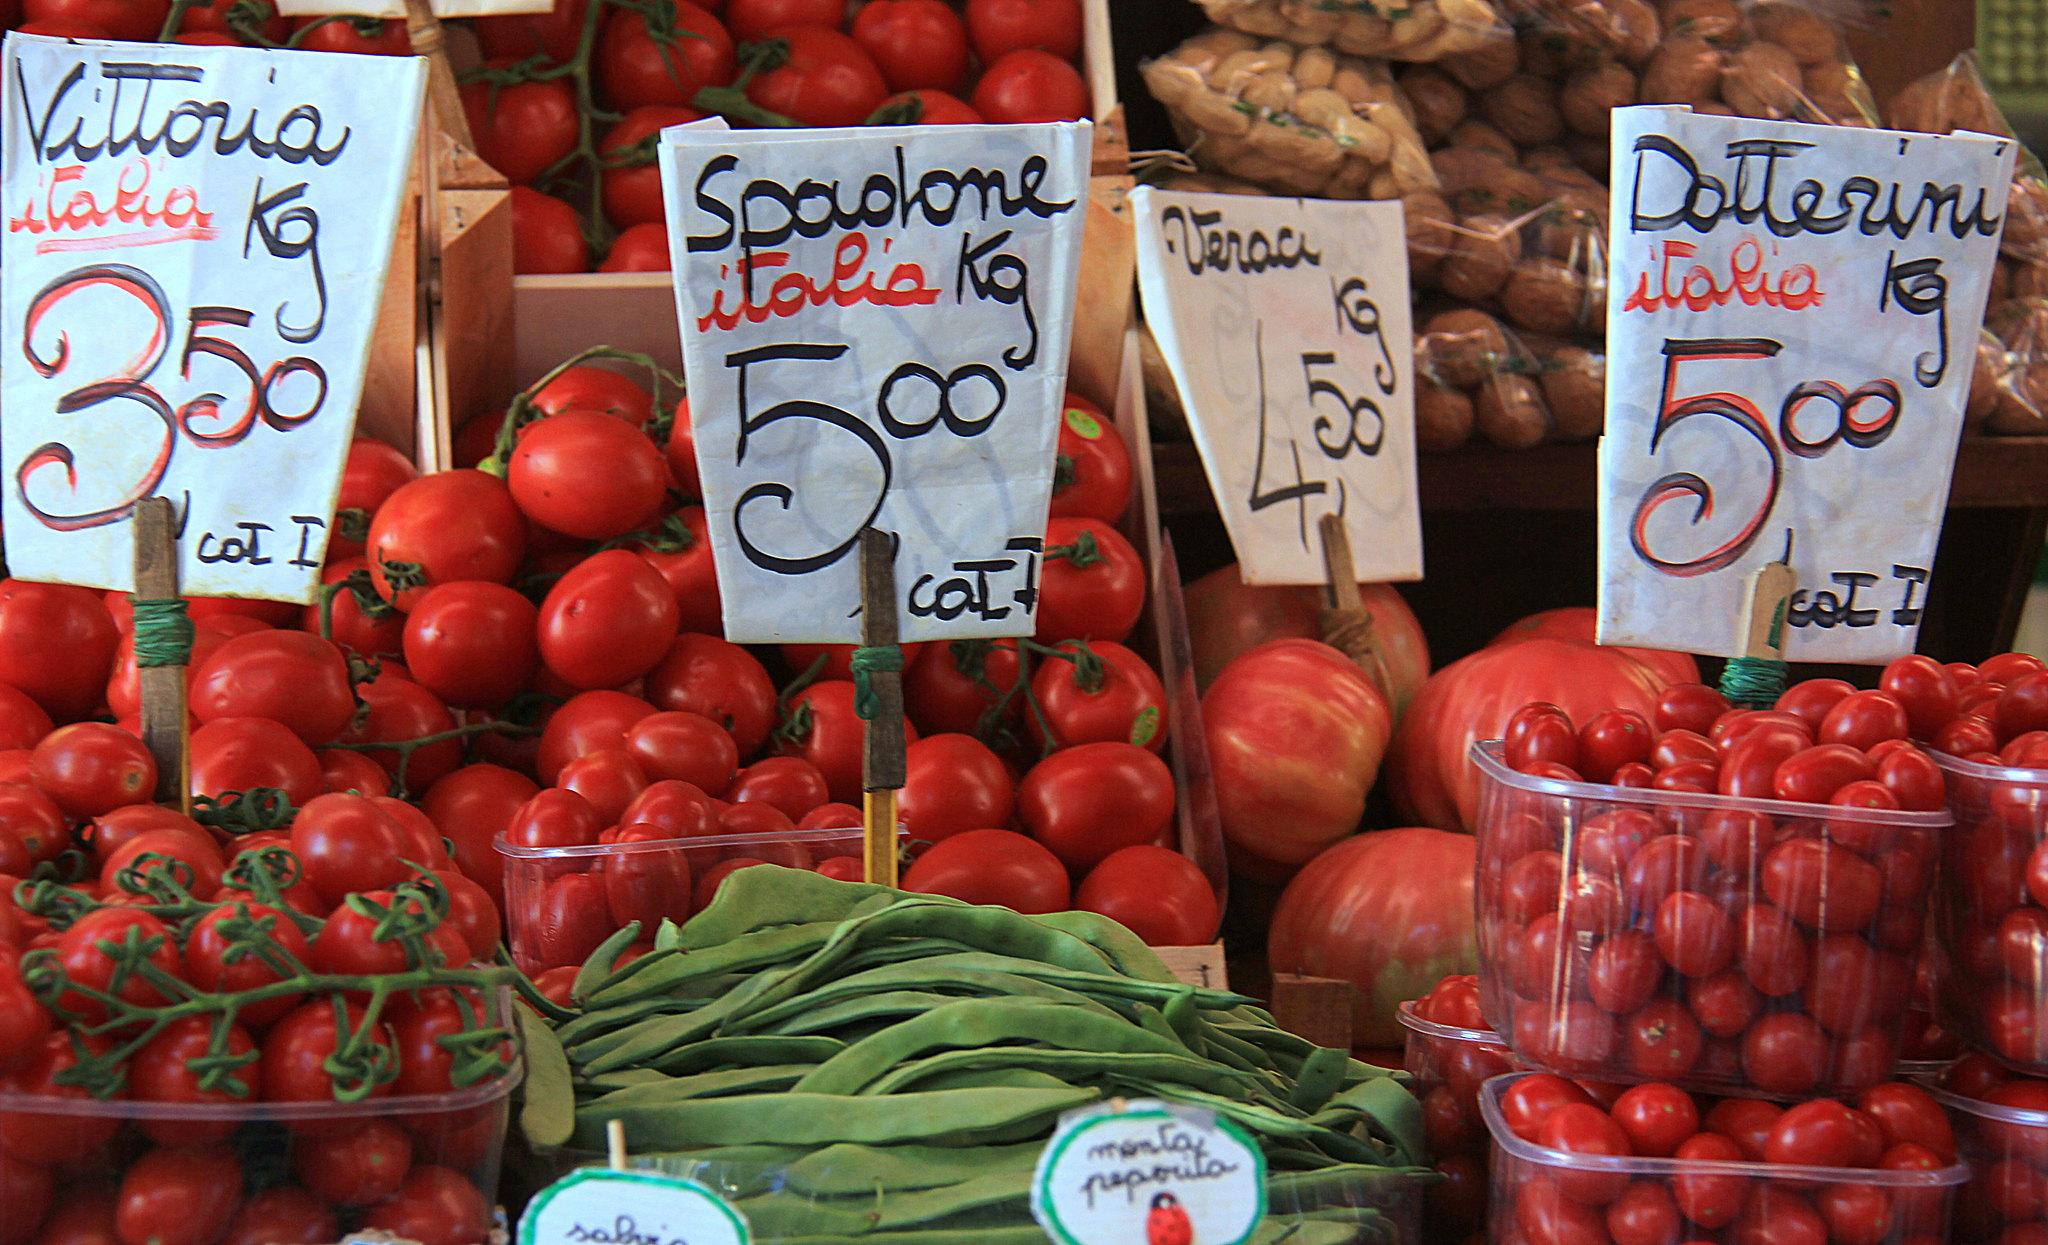 Tomatoes for sale at the Erberia at Rialto Markets in Venice